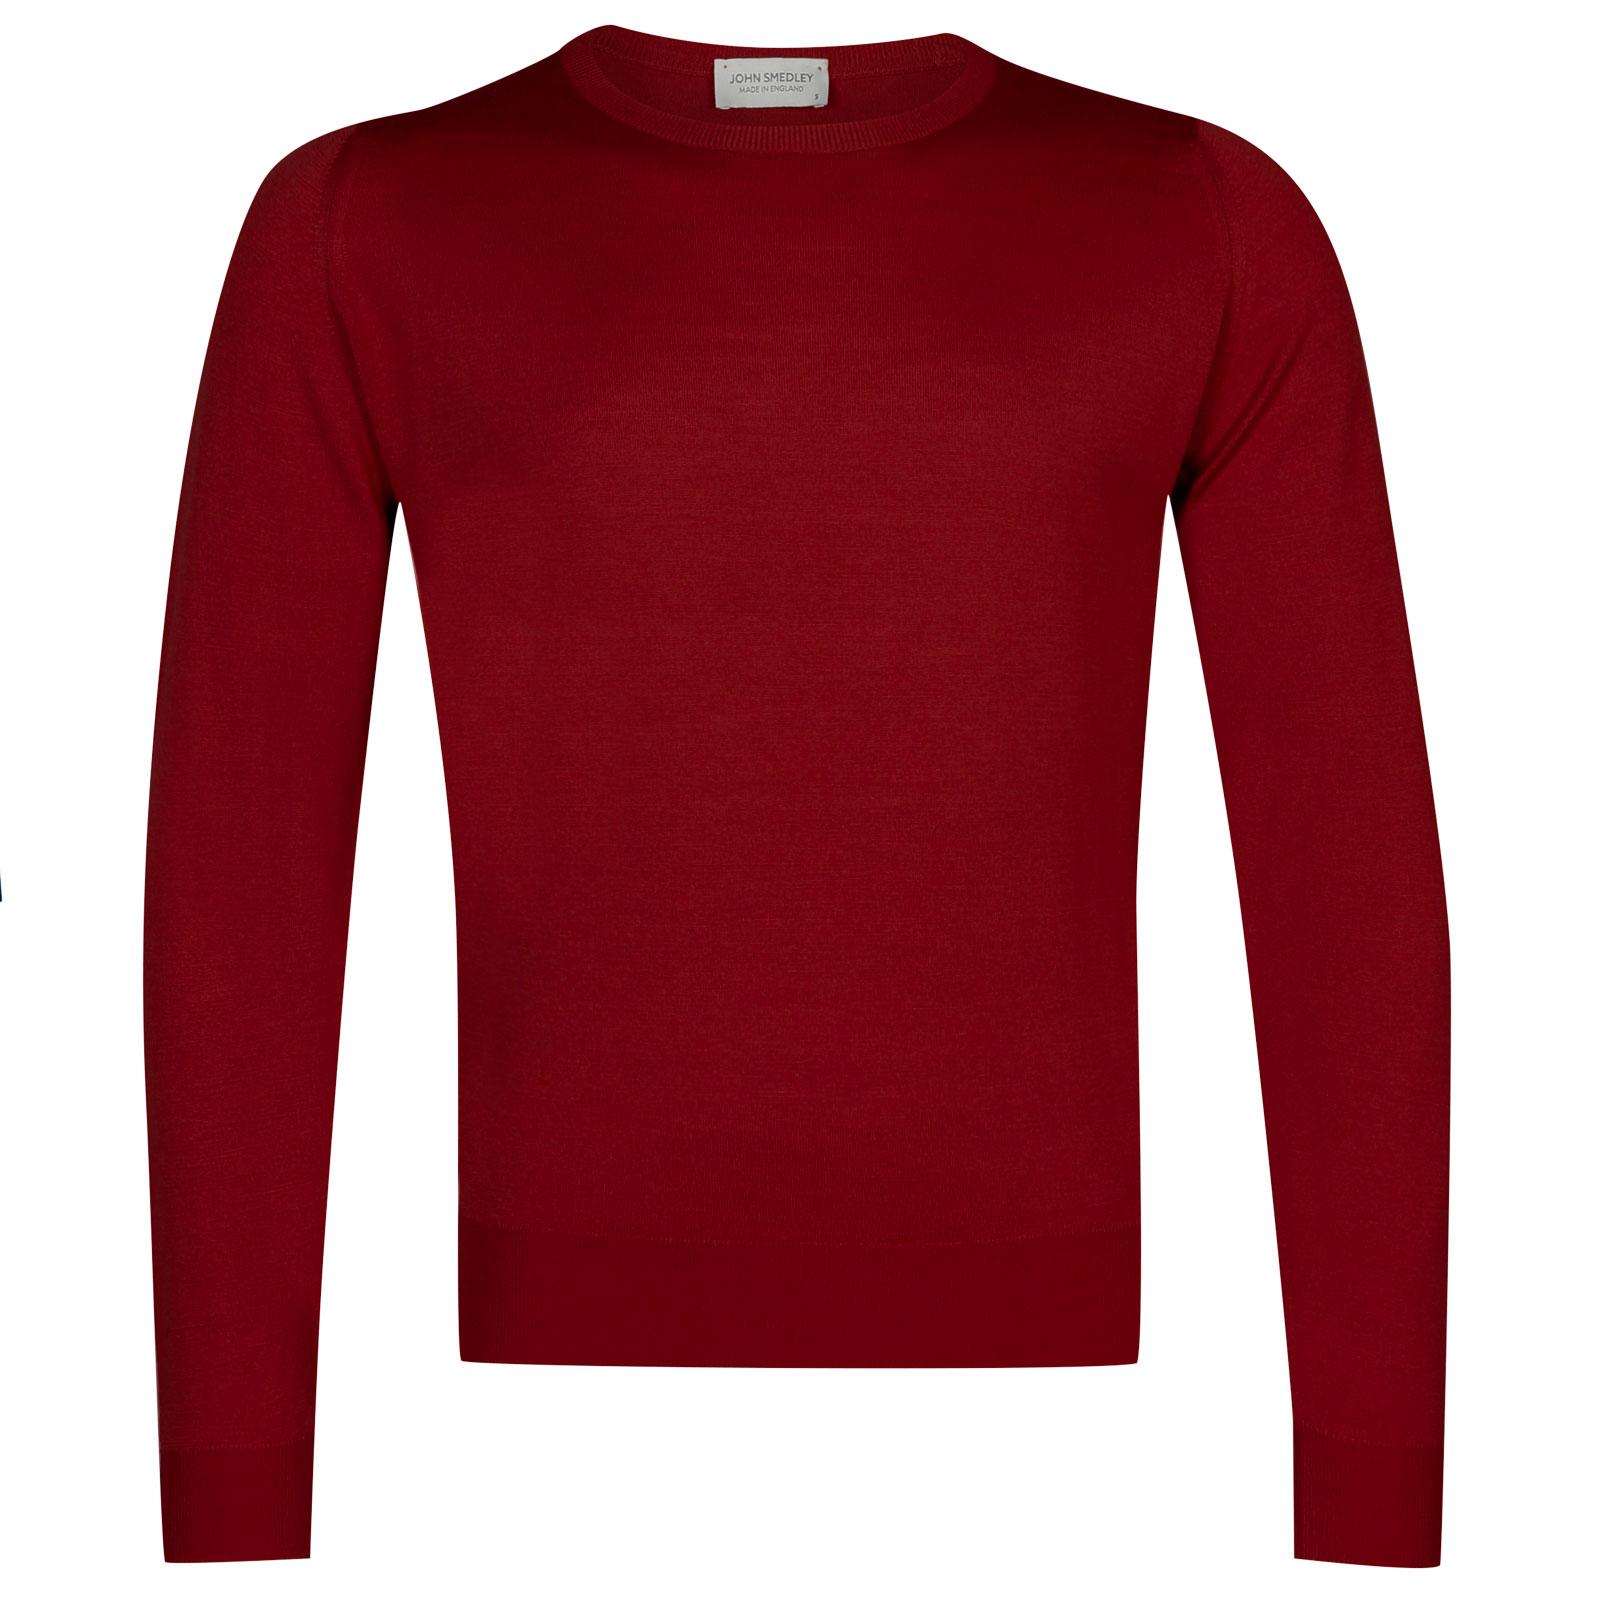 John Smedley sicily Merino Wool Pullover in Crimson Forest-XL